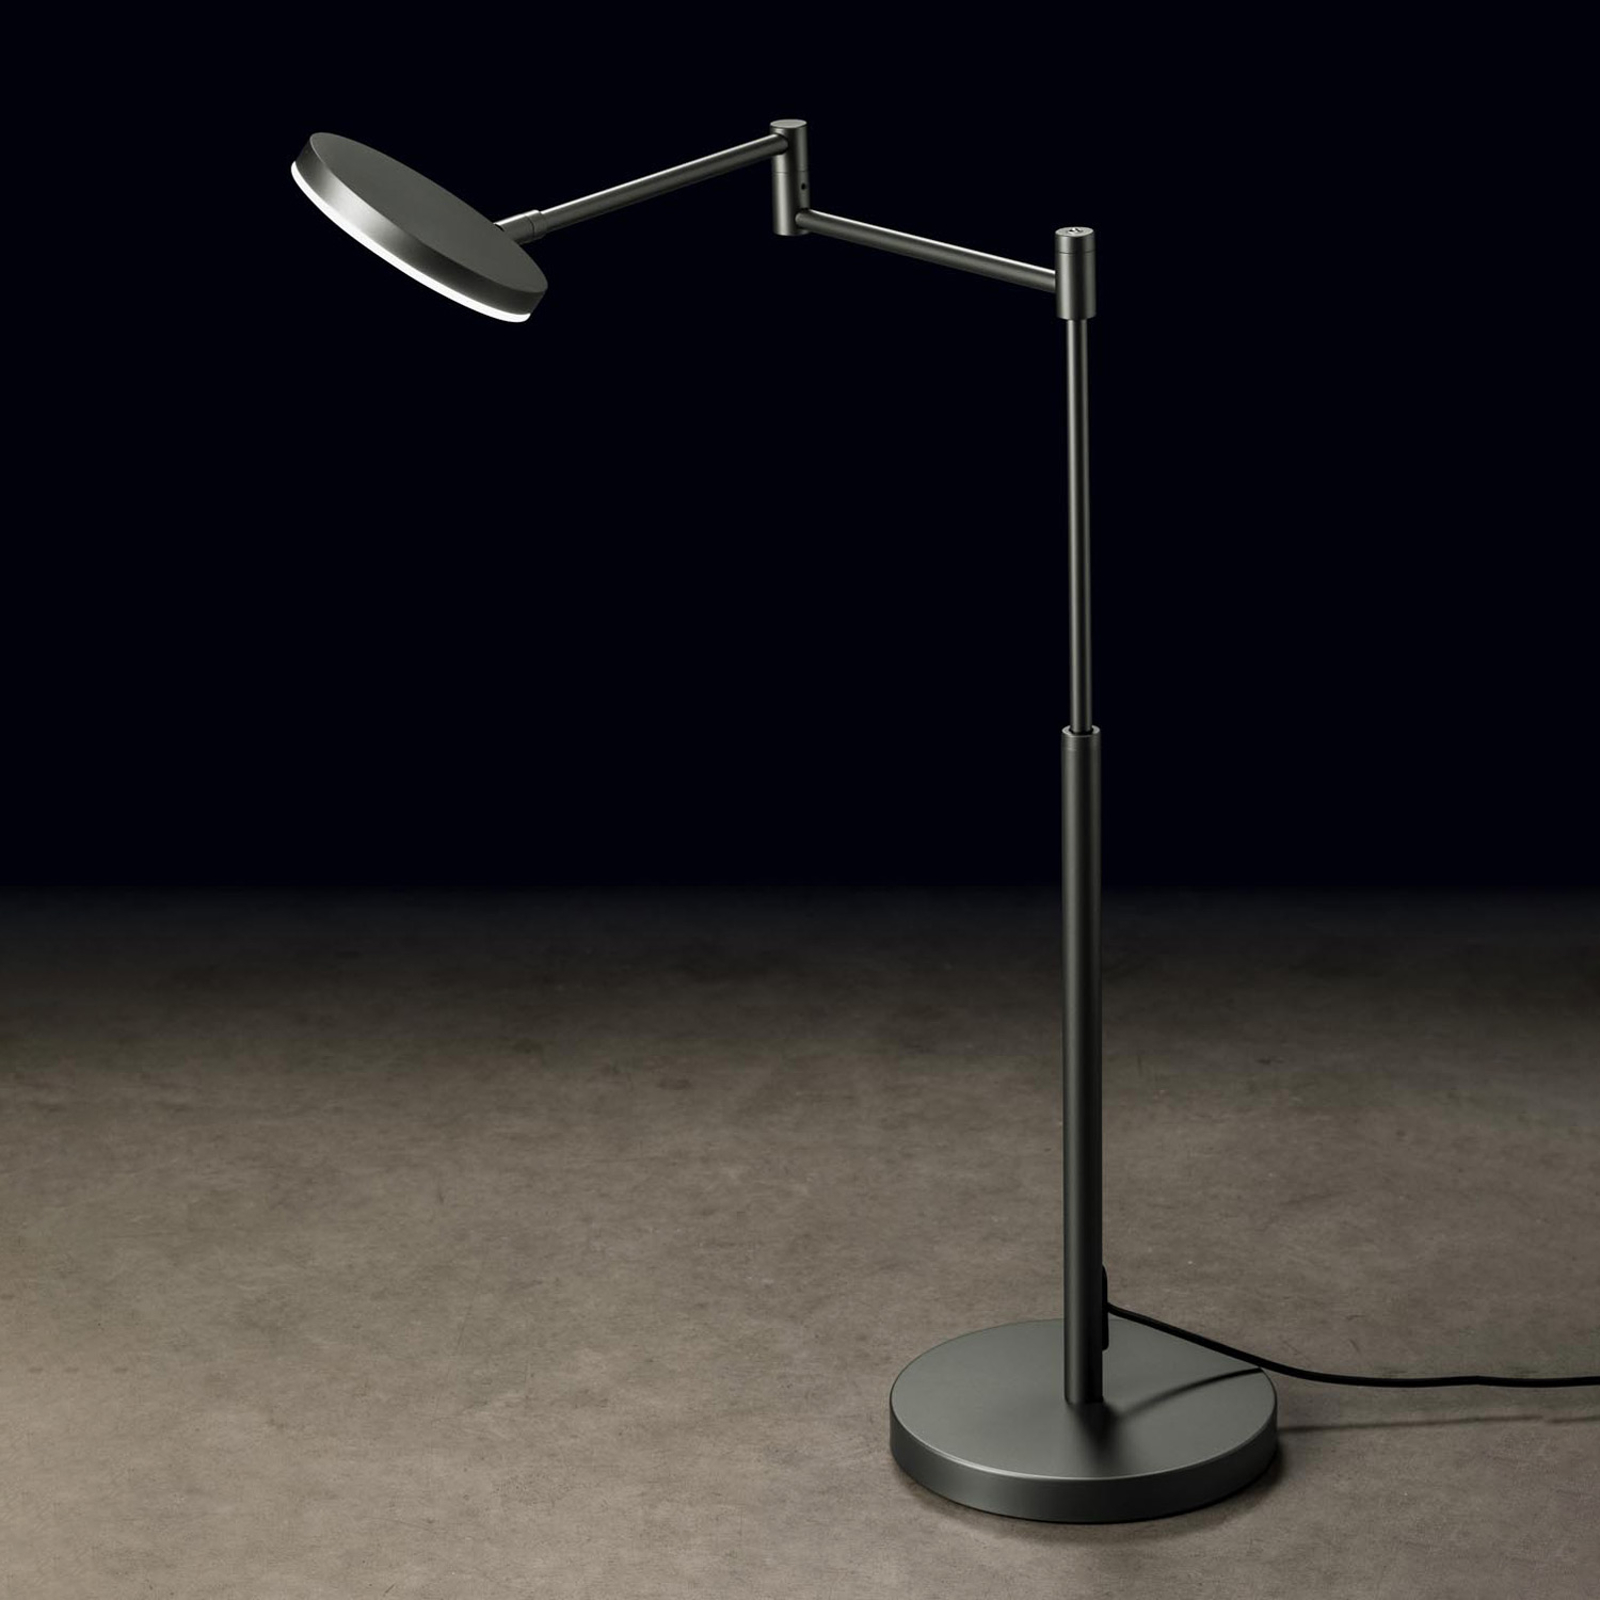 Holtkötter Plano T LED-Tischlampe platin